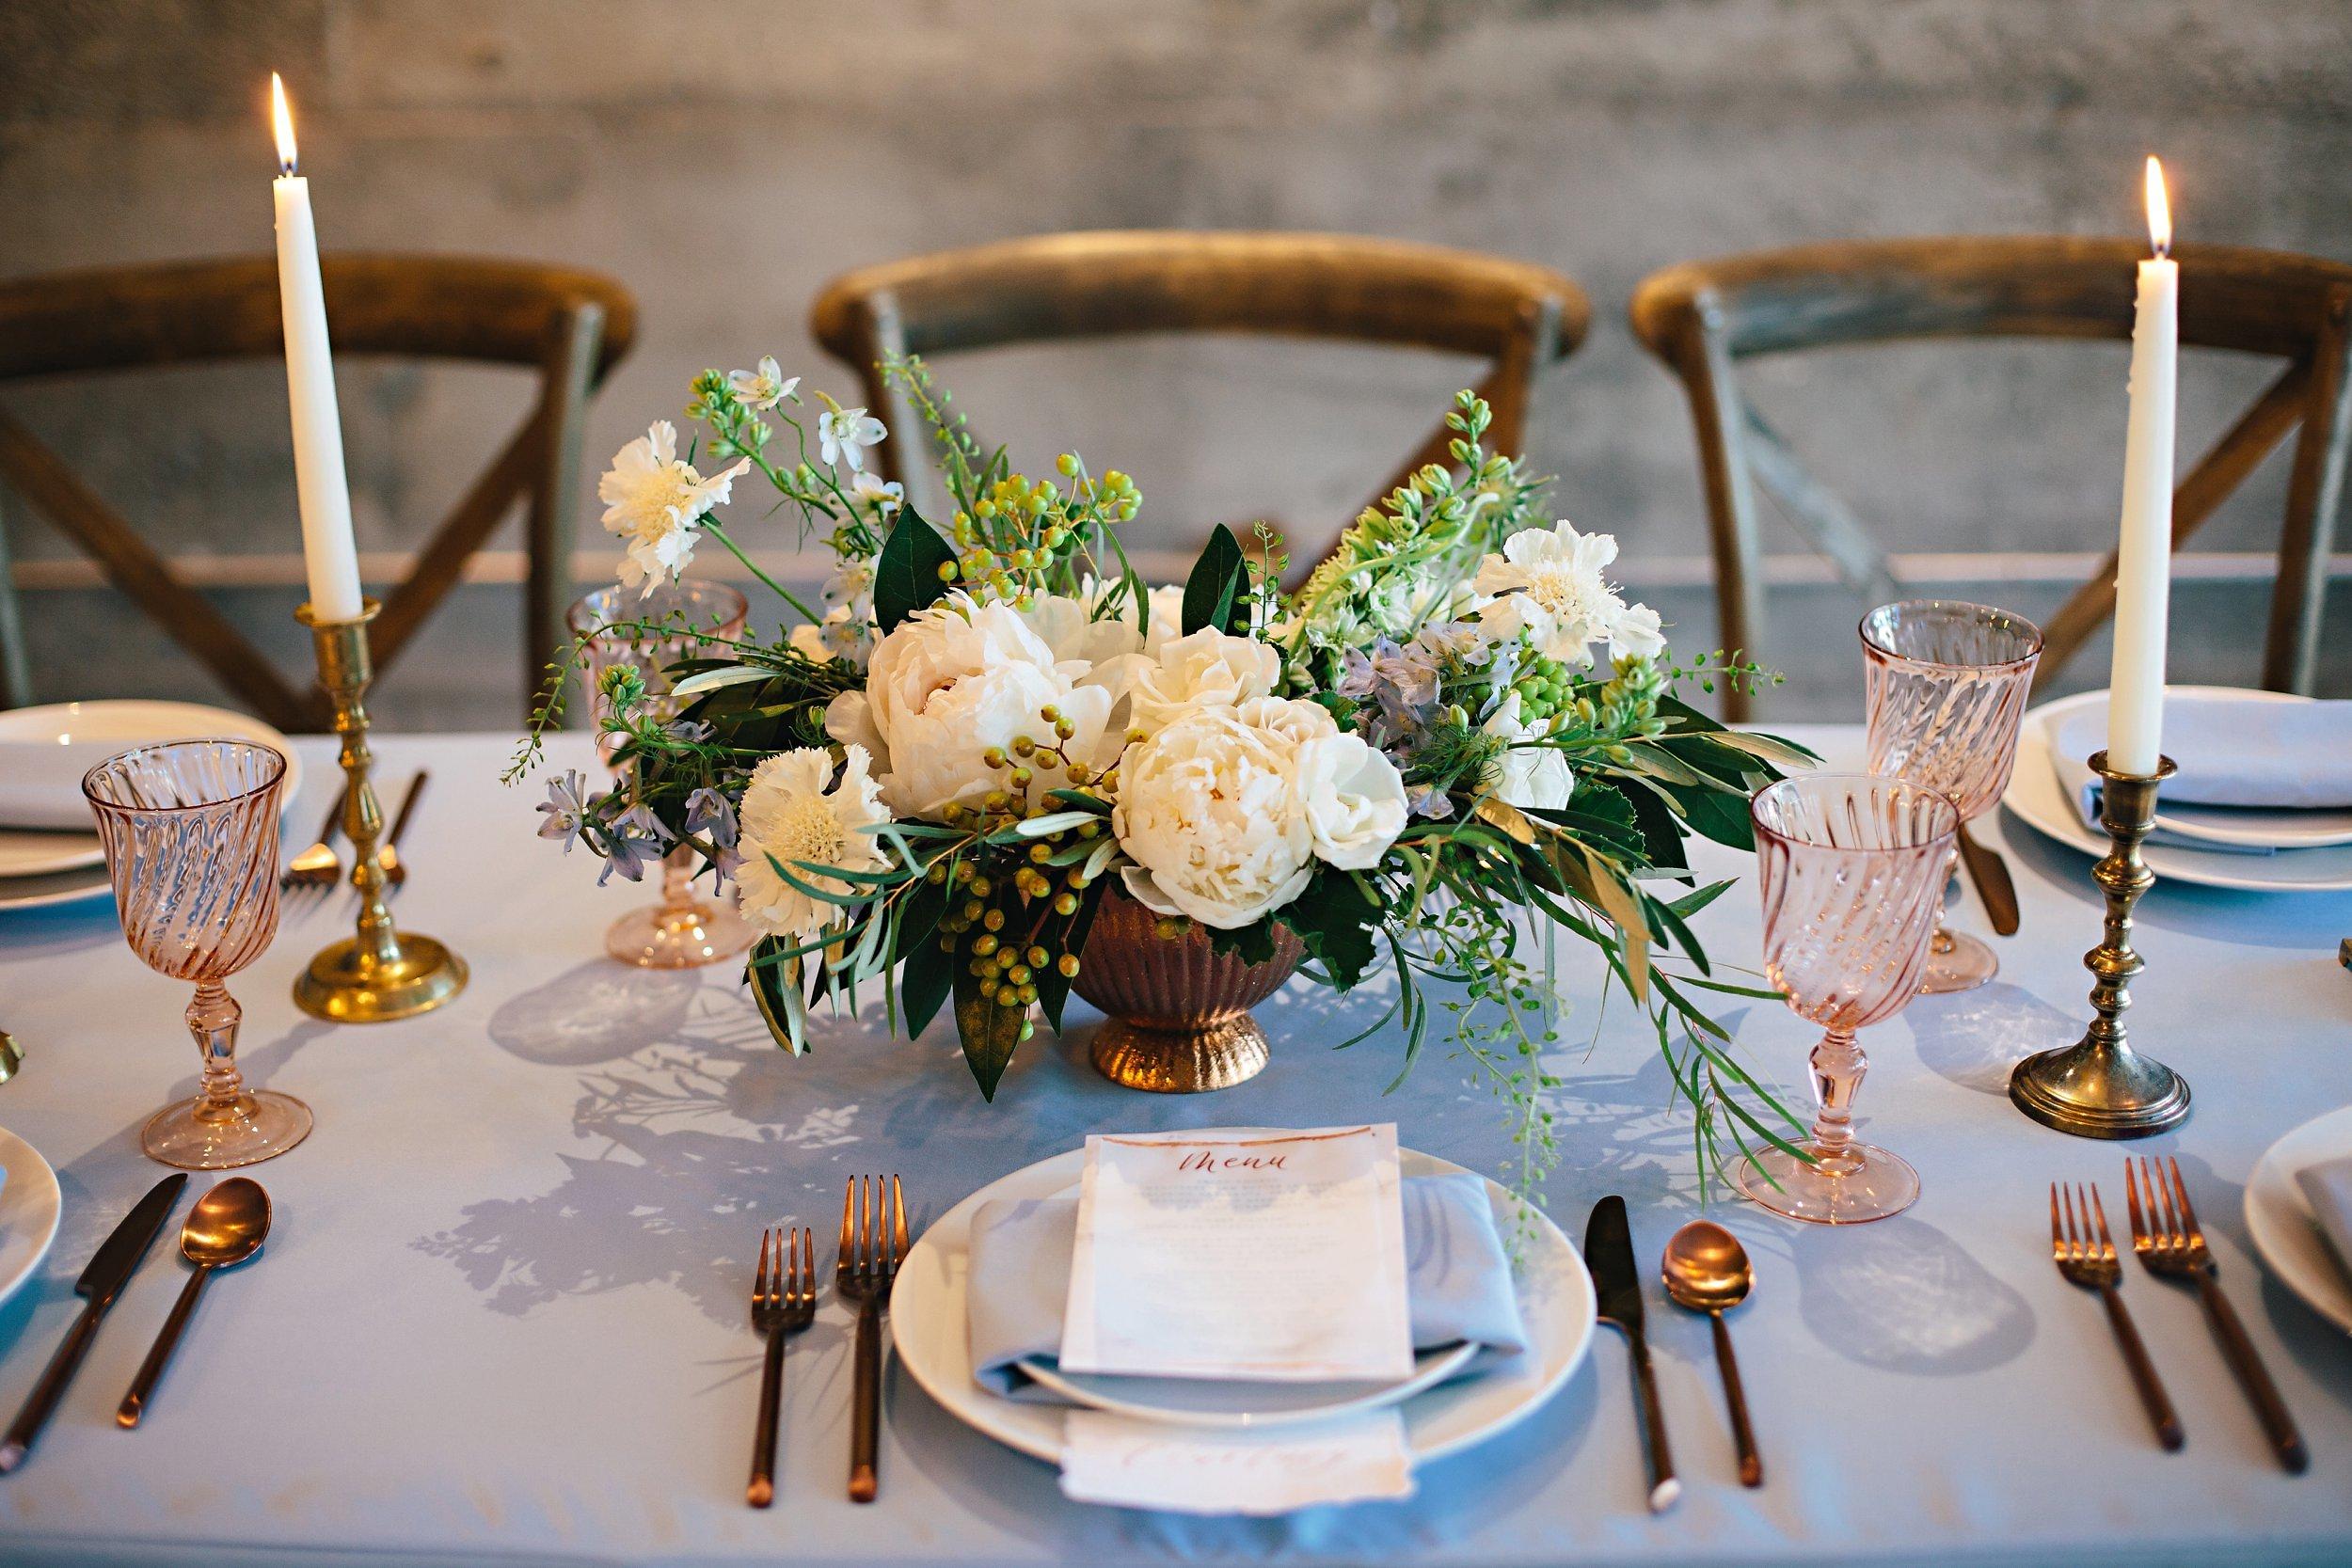 Copy of Summer Garden Wedding: Tabletop floral